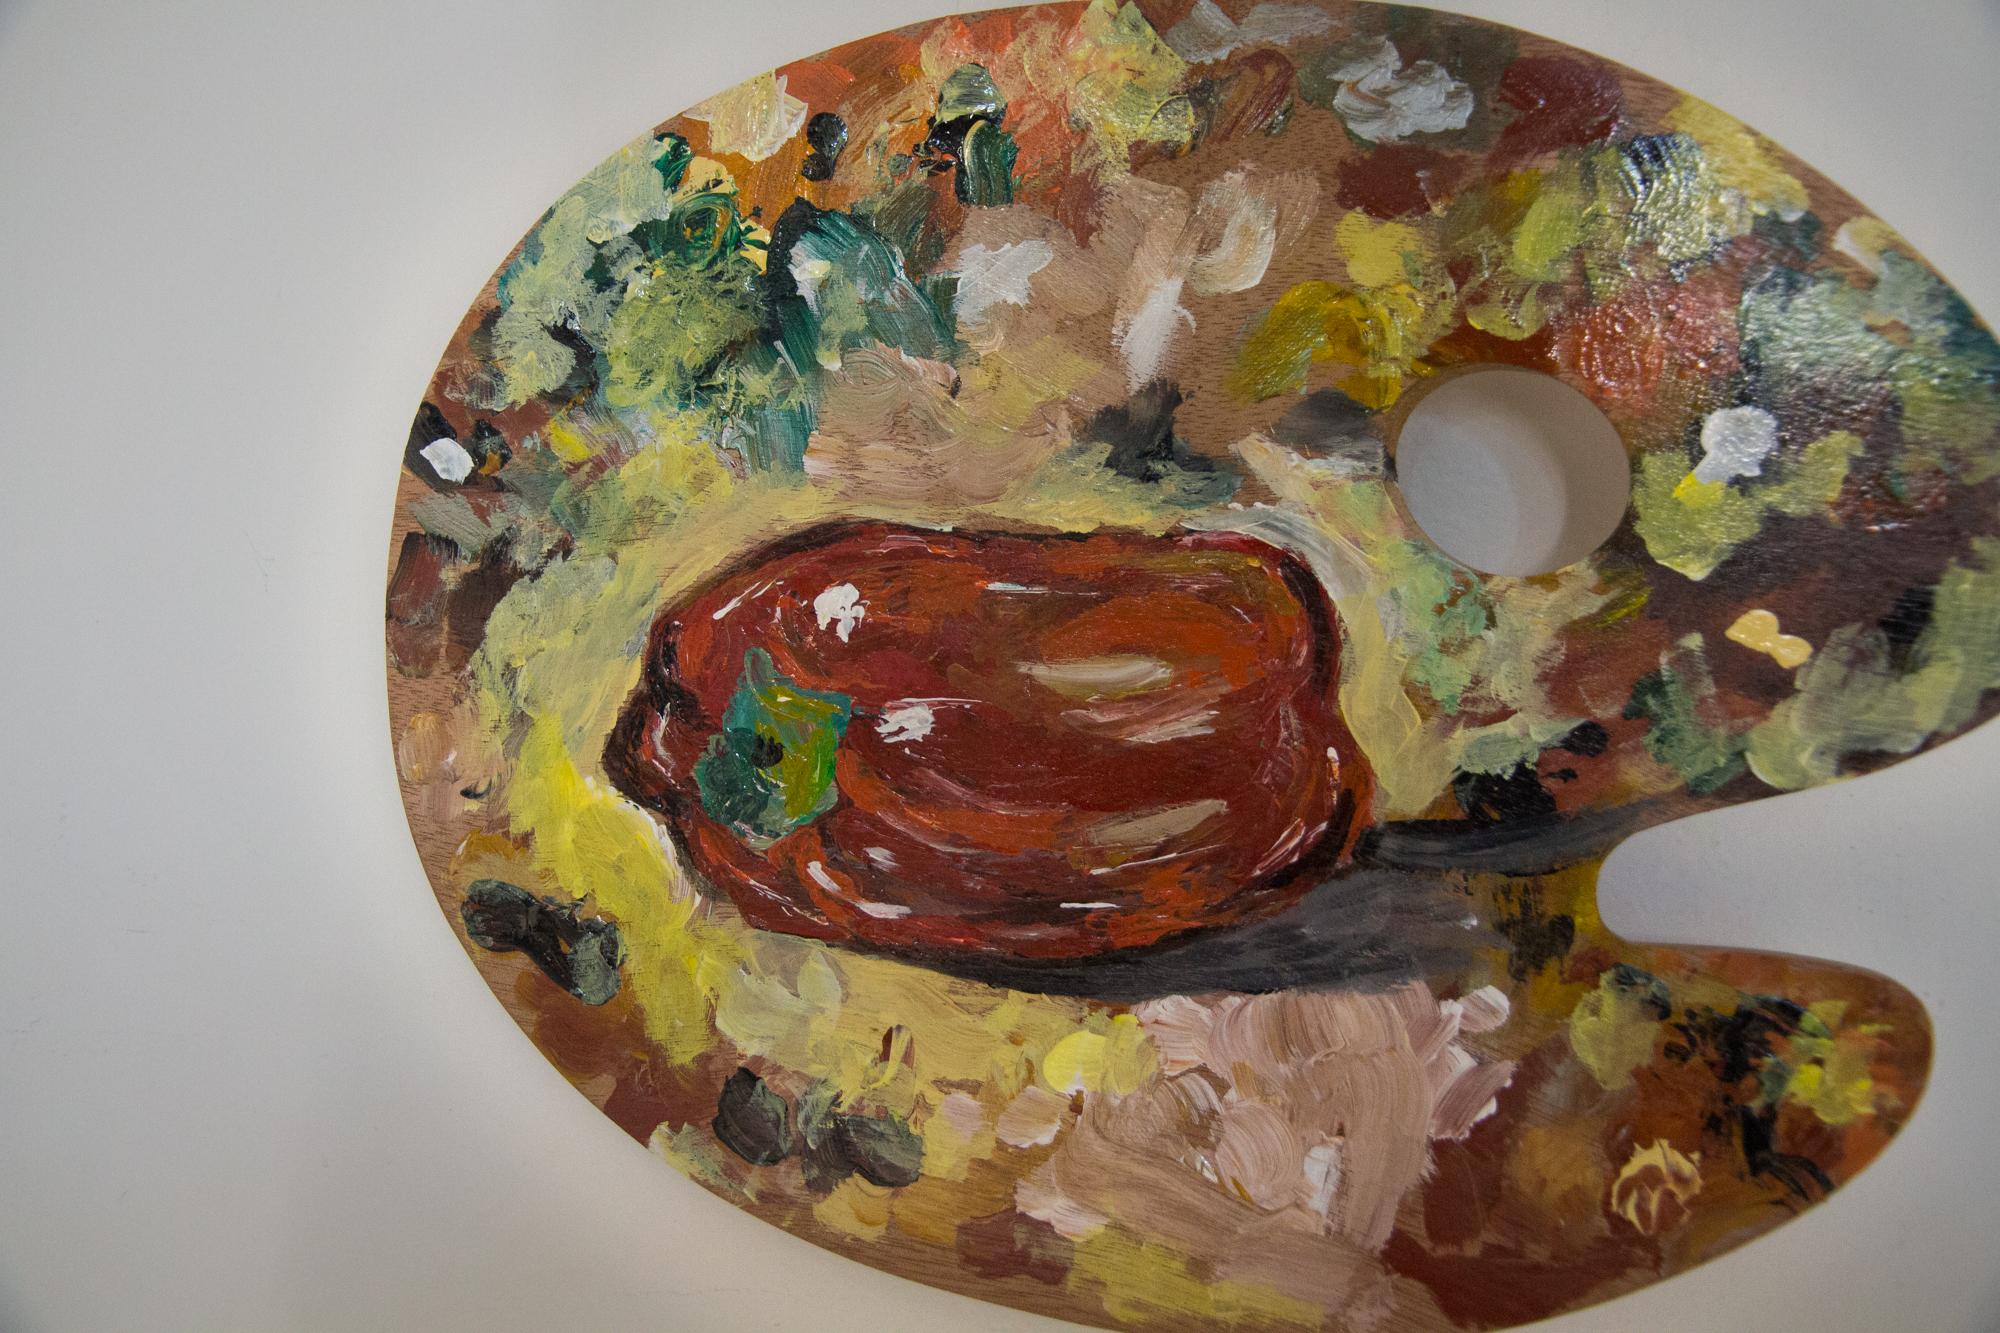 le poivron, 2017, huile